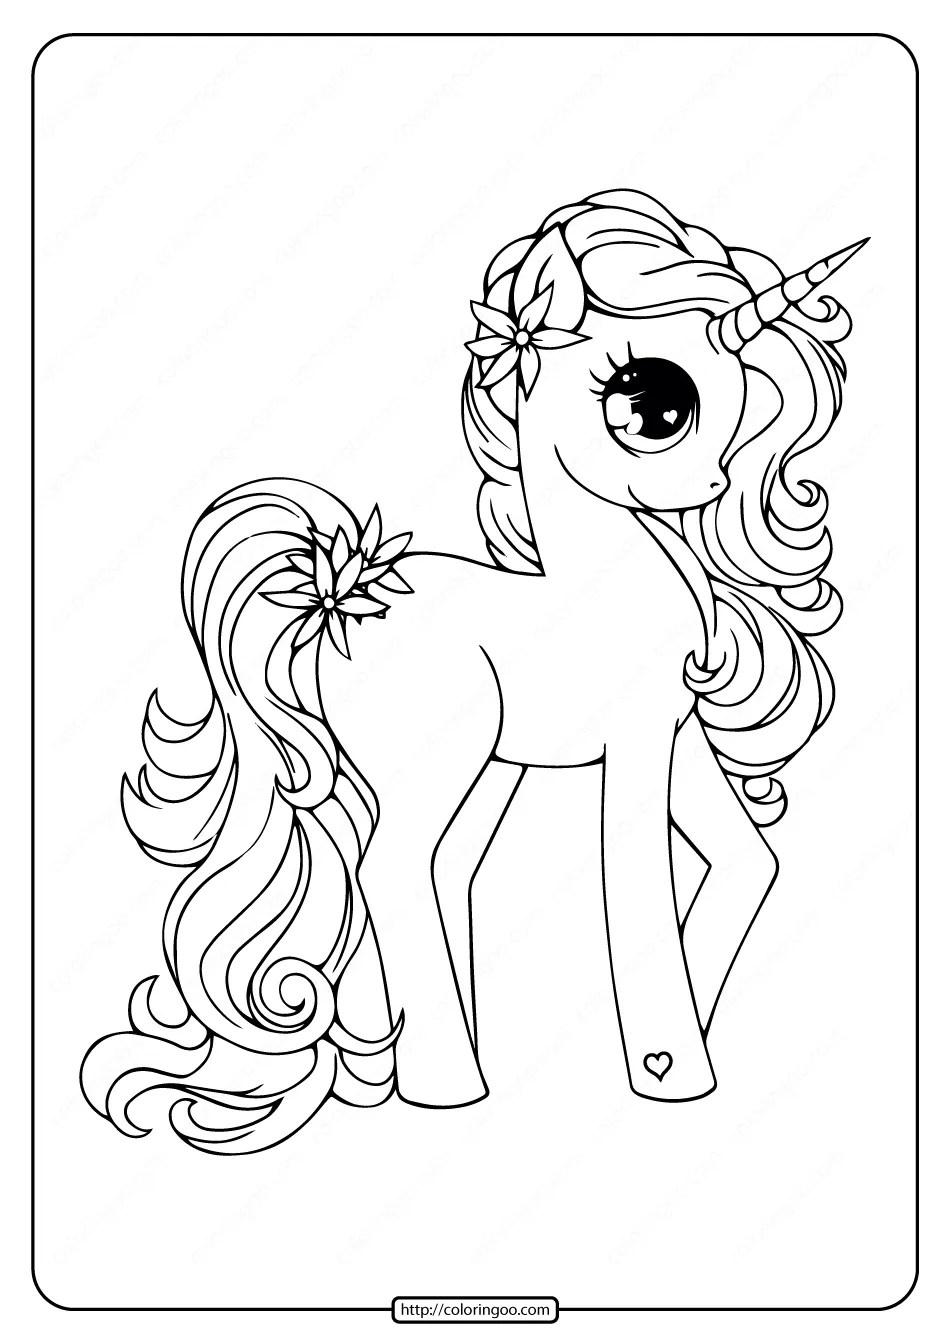 Printable Free Unicorn Pdf Coloring Book